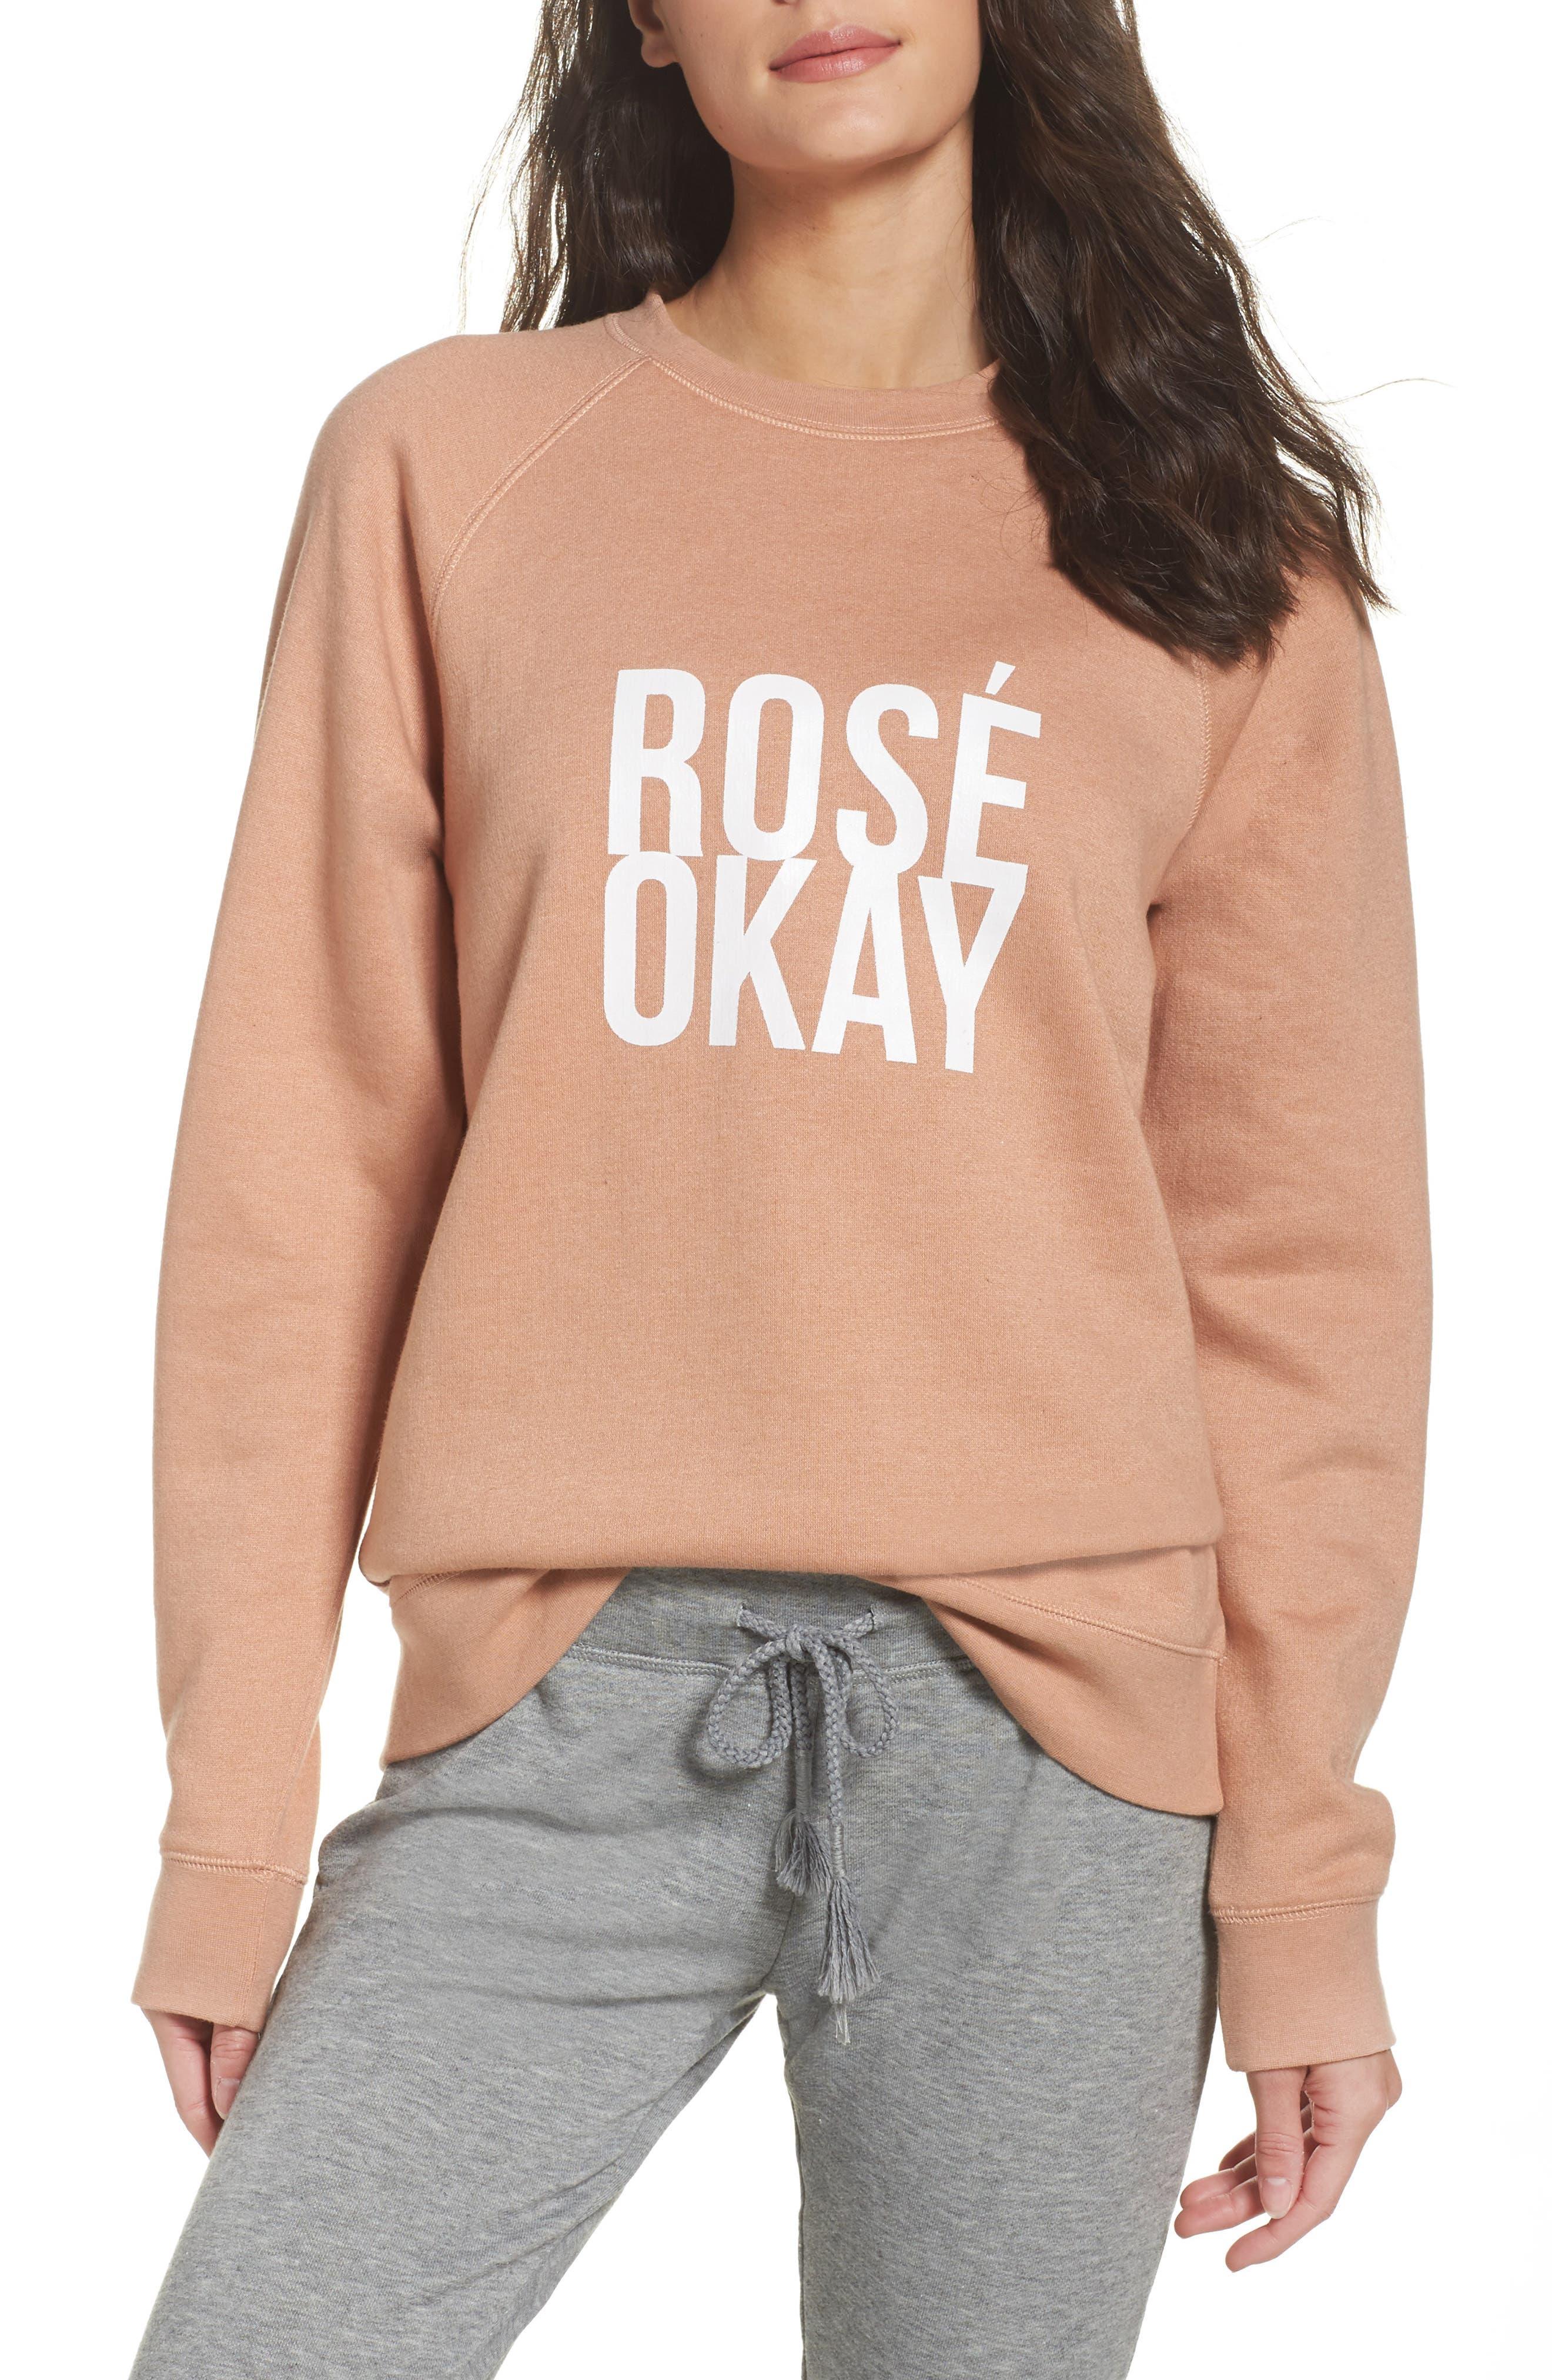 Rosé Okay Sweatshirt,                         Main,                         color, Beige